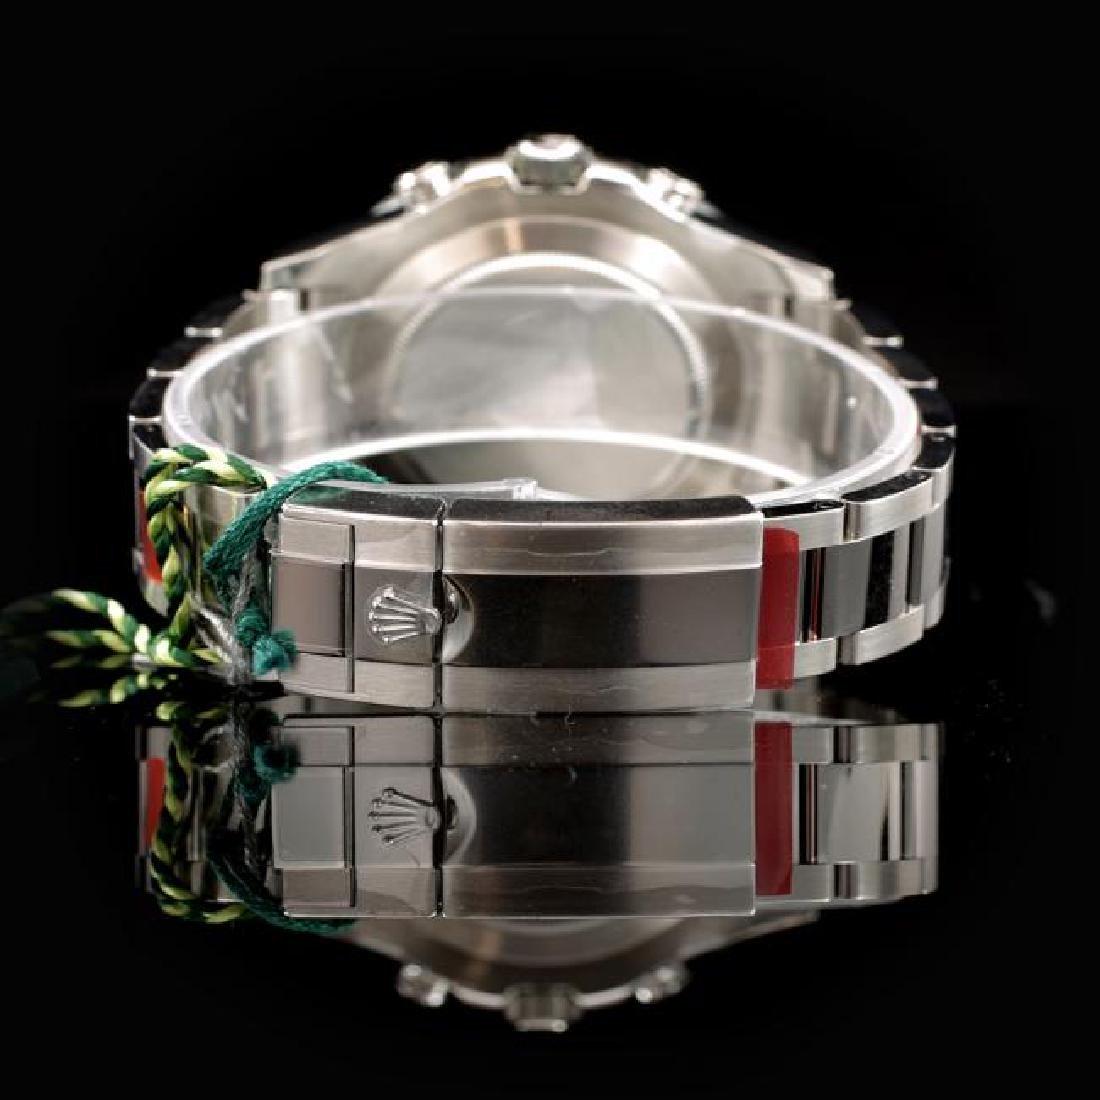 Rolex YachtMaster SS 44mm Mens Wristwatch - 3